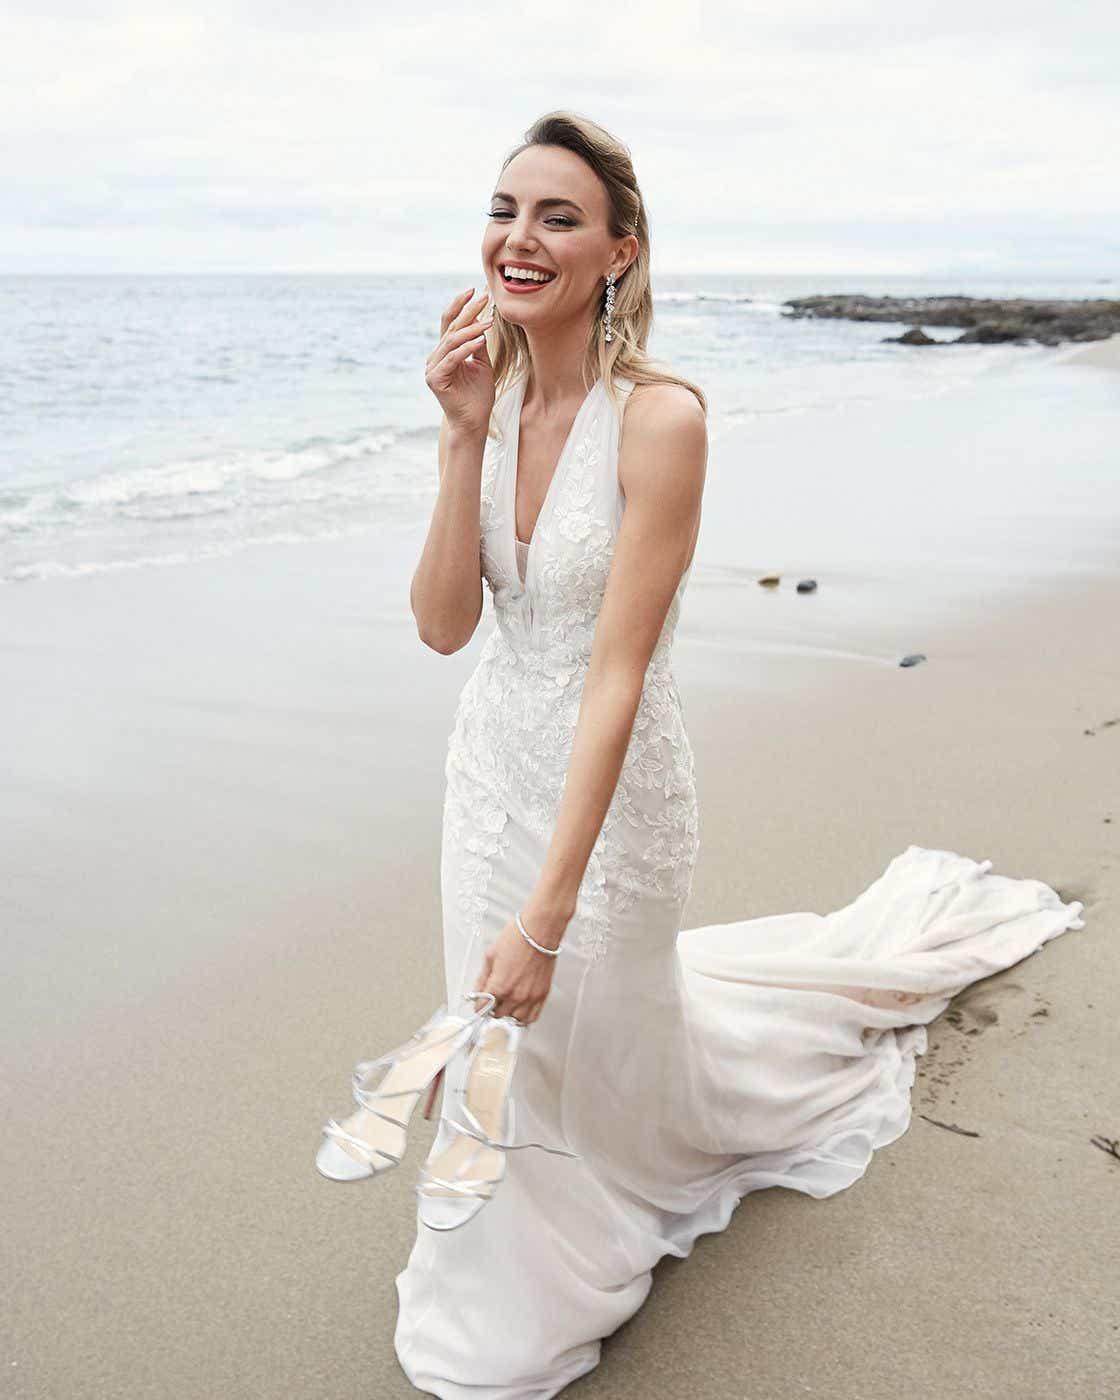 Classic Style Off White Mermaid Wedding Dress - Editorial